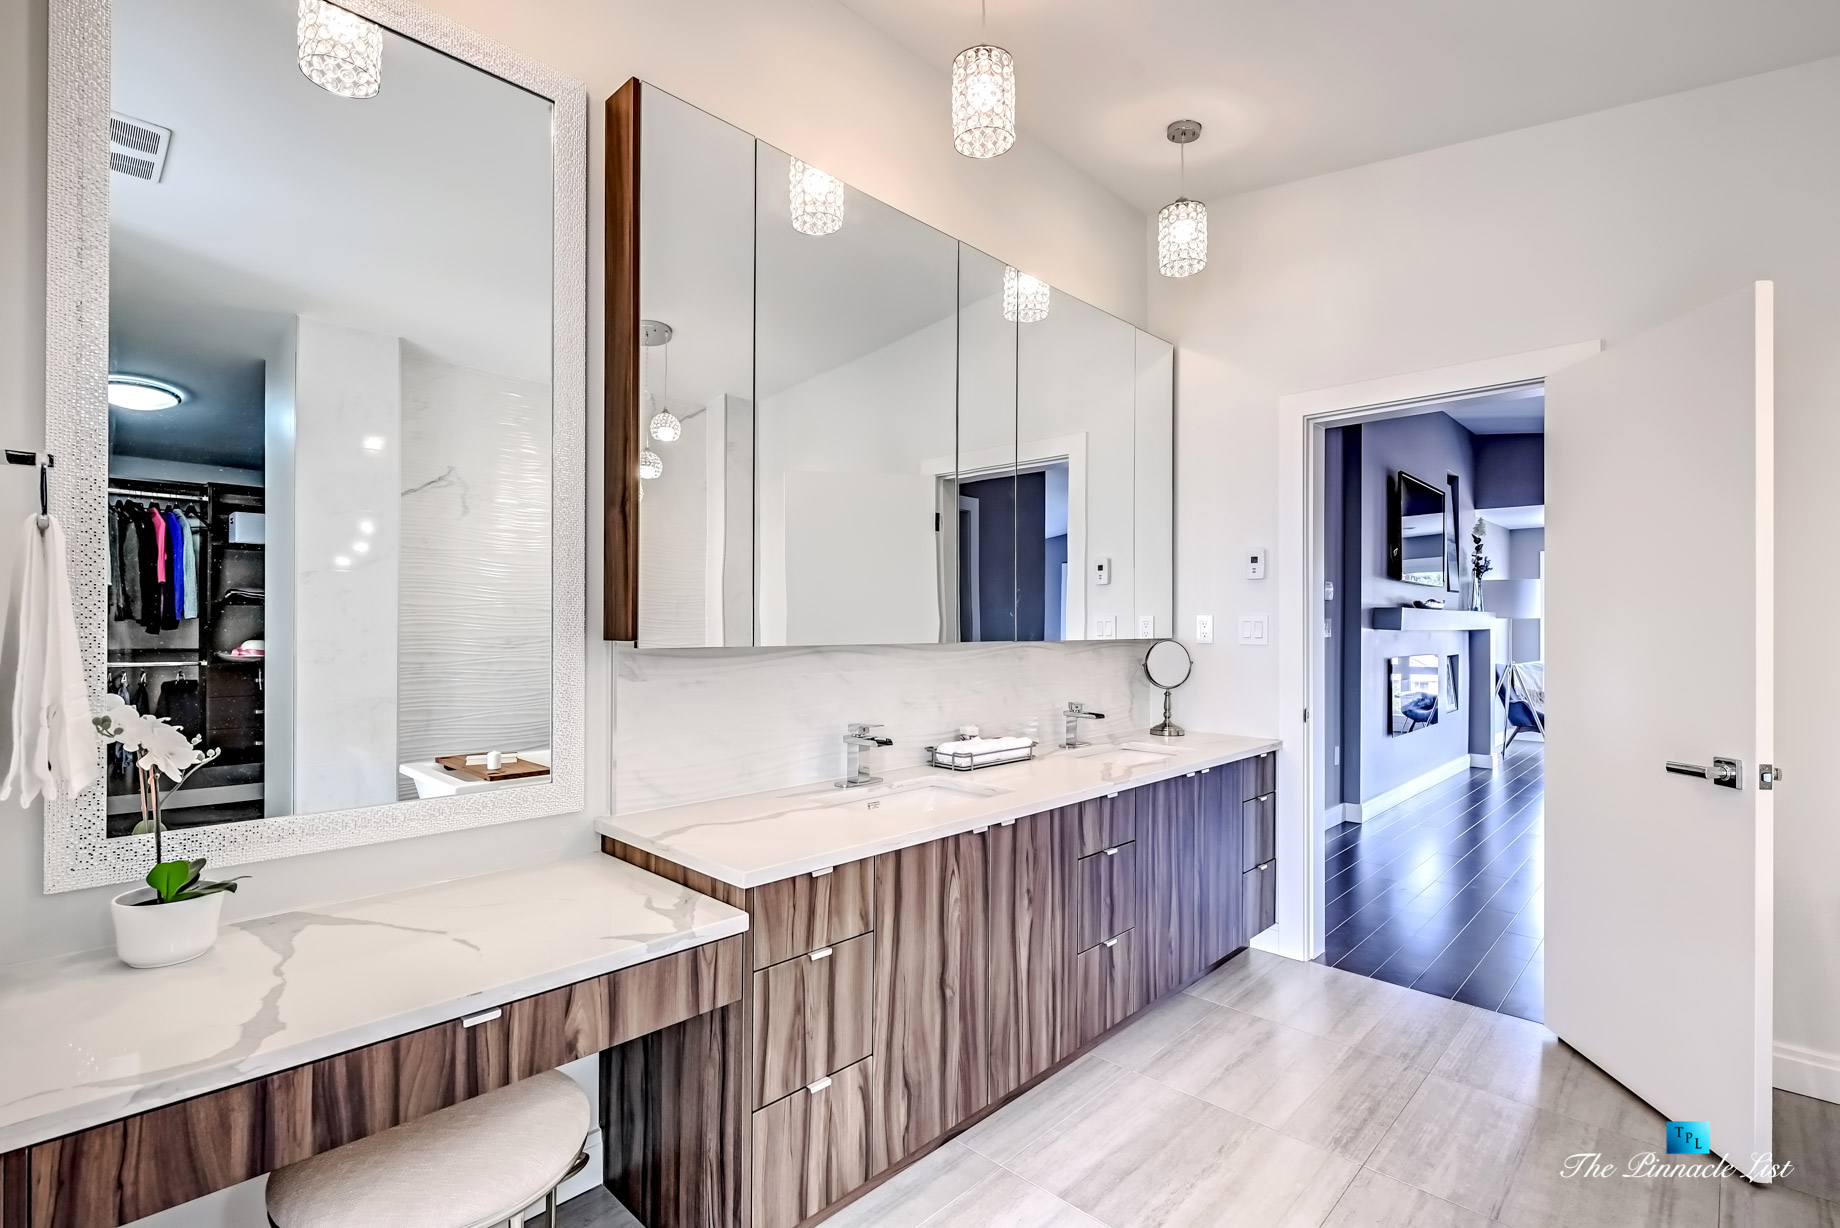 1740 Grover Ave, Coquitlam, BC, Canada